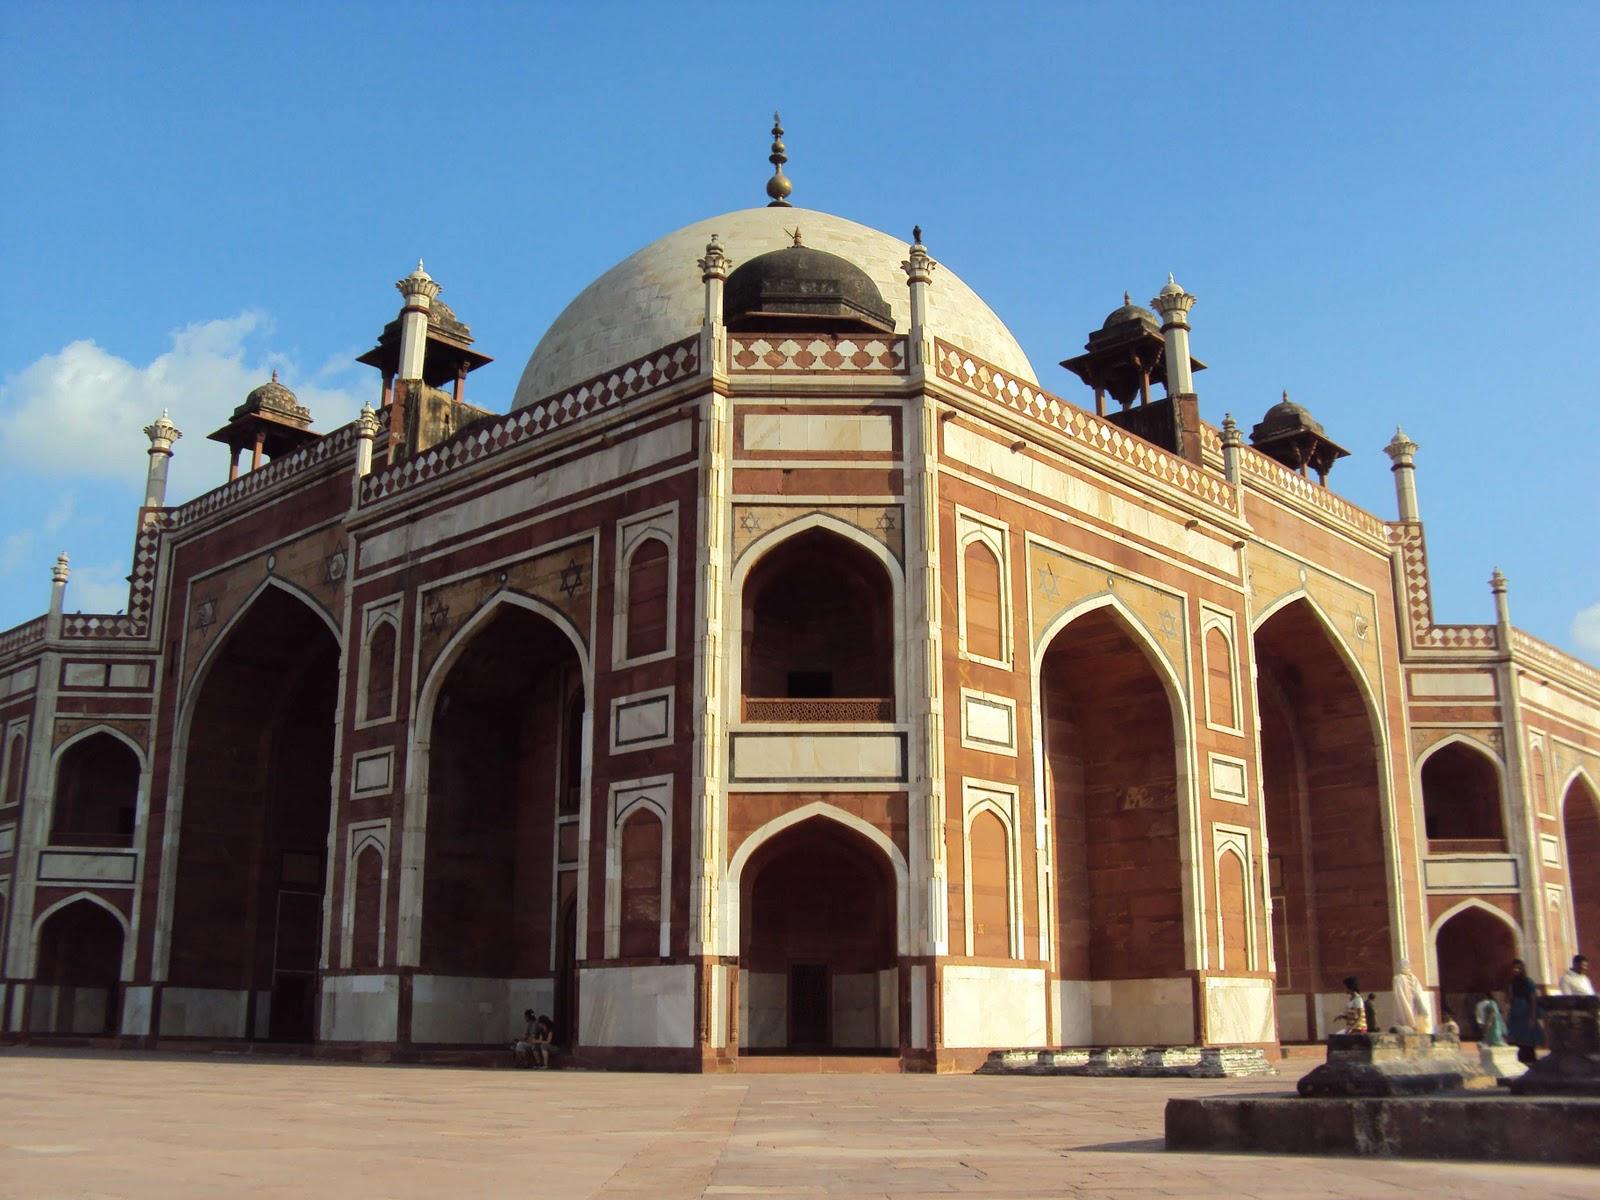 ARCHITECTURE STUDENT'S CORNER HUMAYUN'S TOMB DELHI